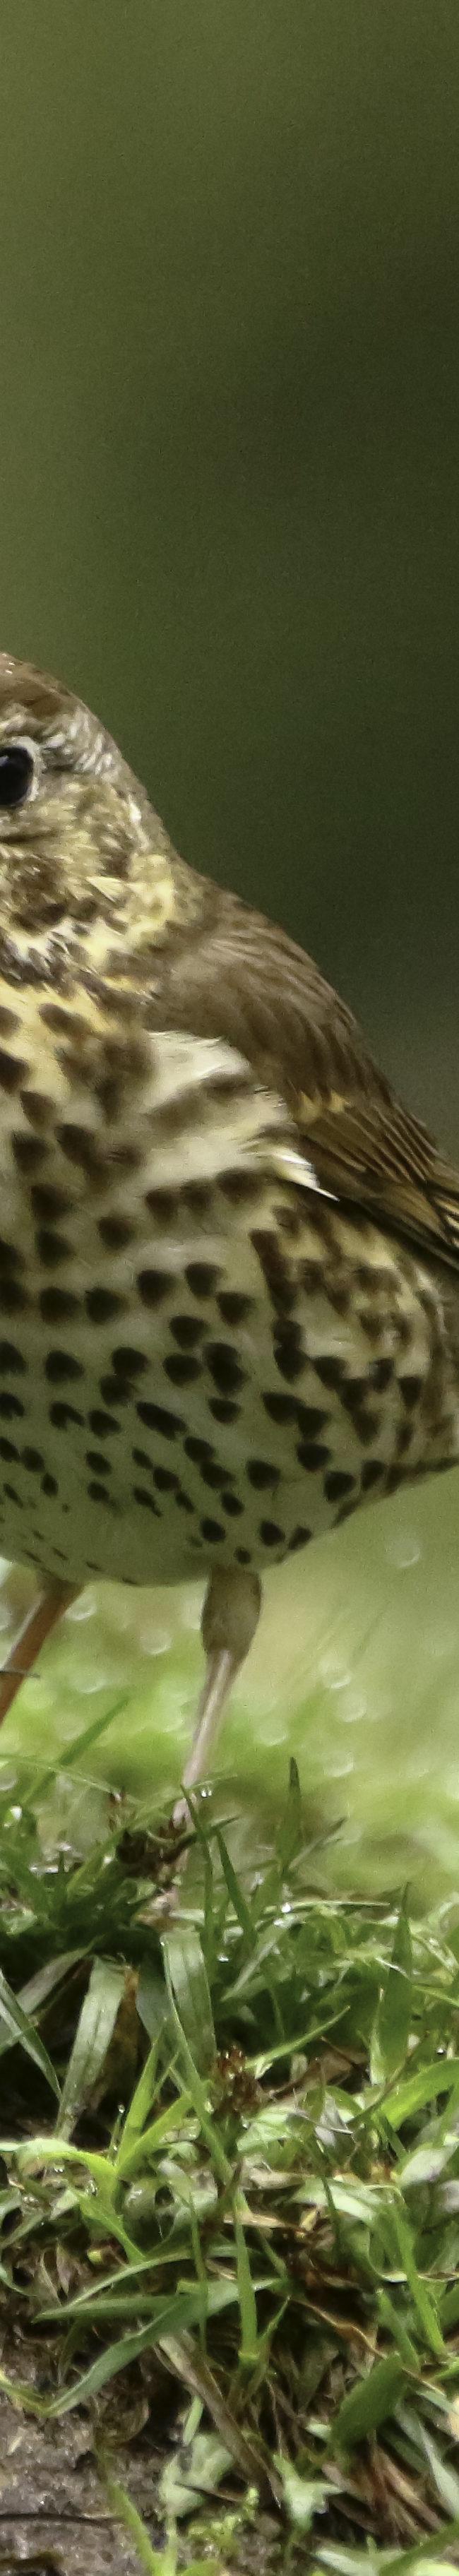 Zanglijster (turdus philomelos)